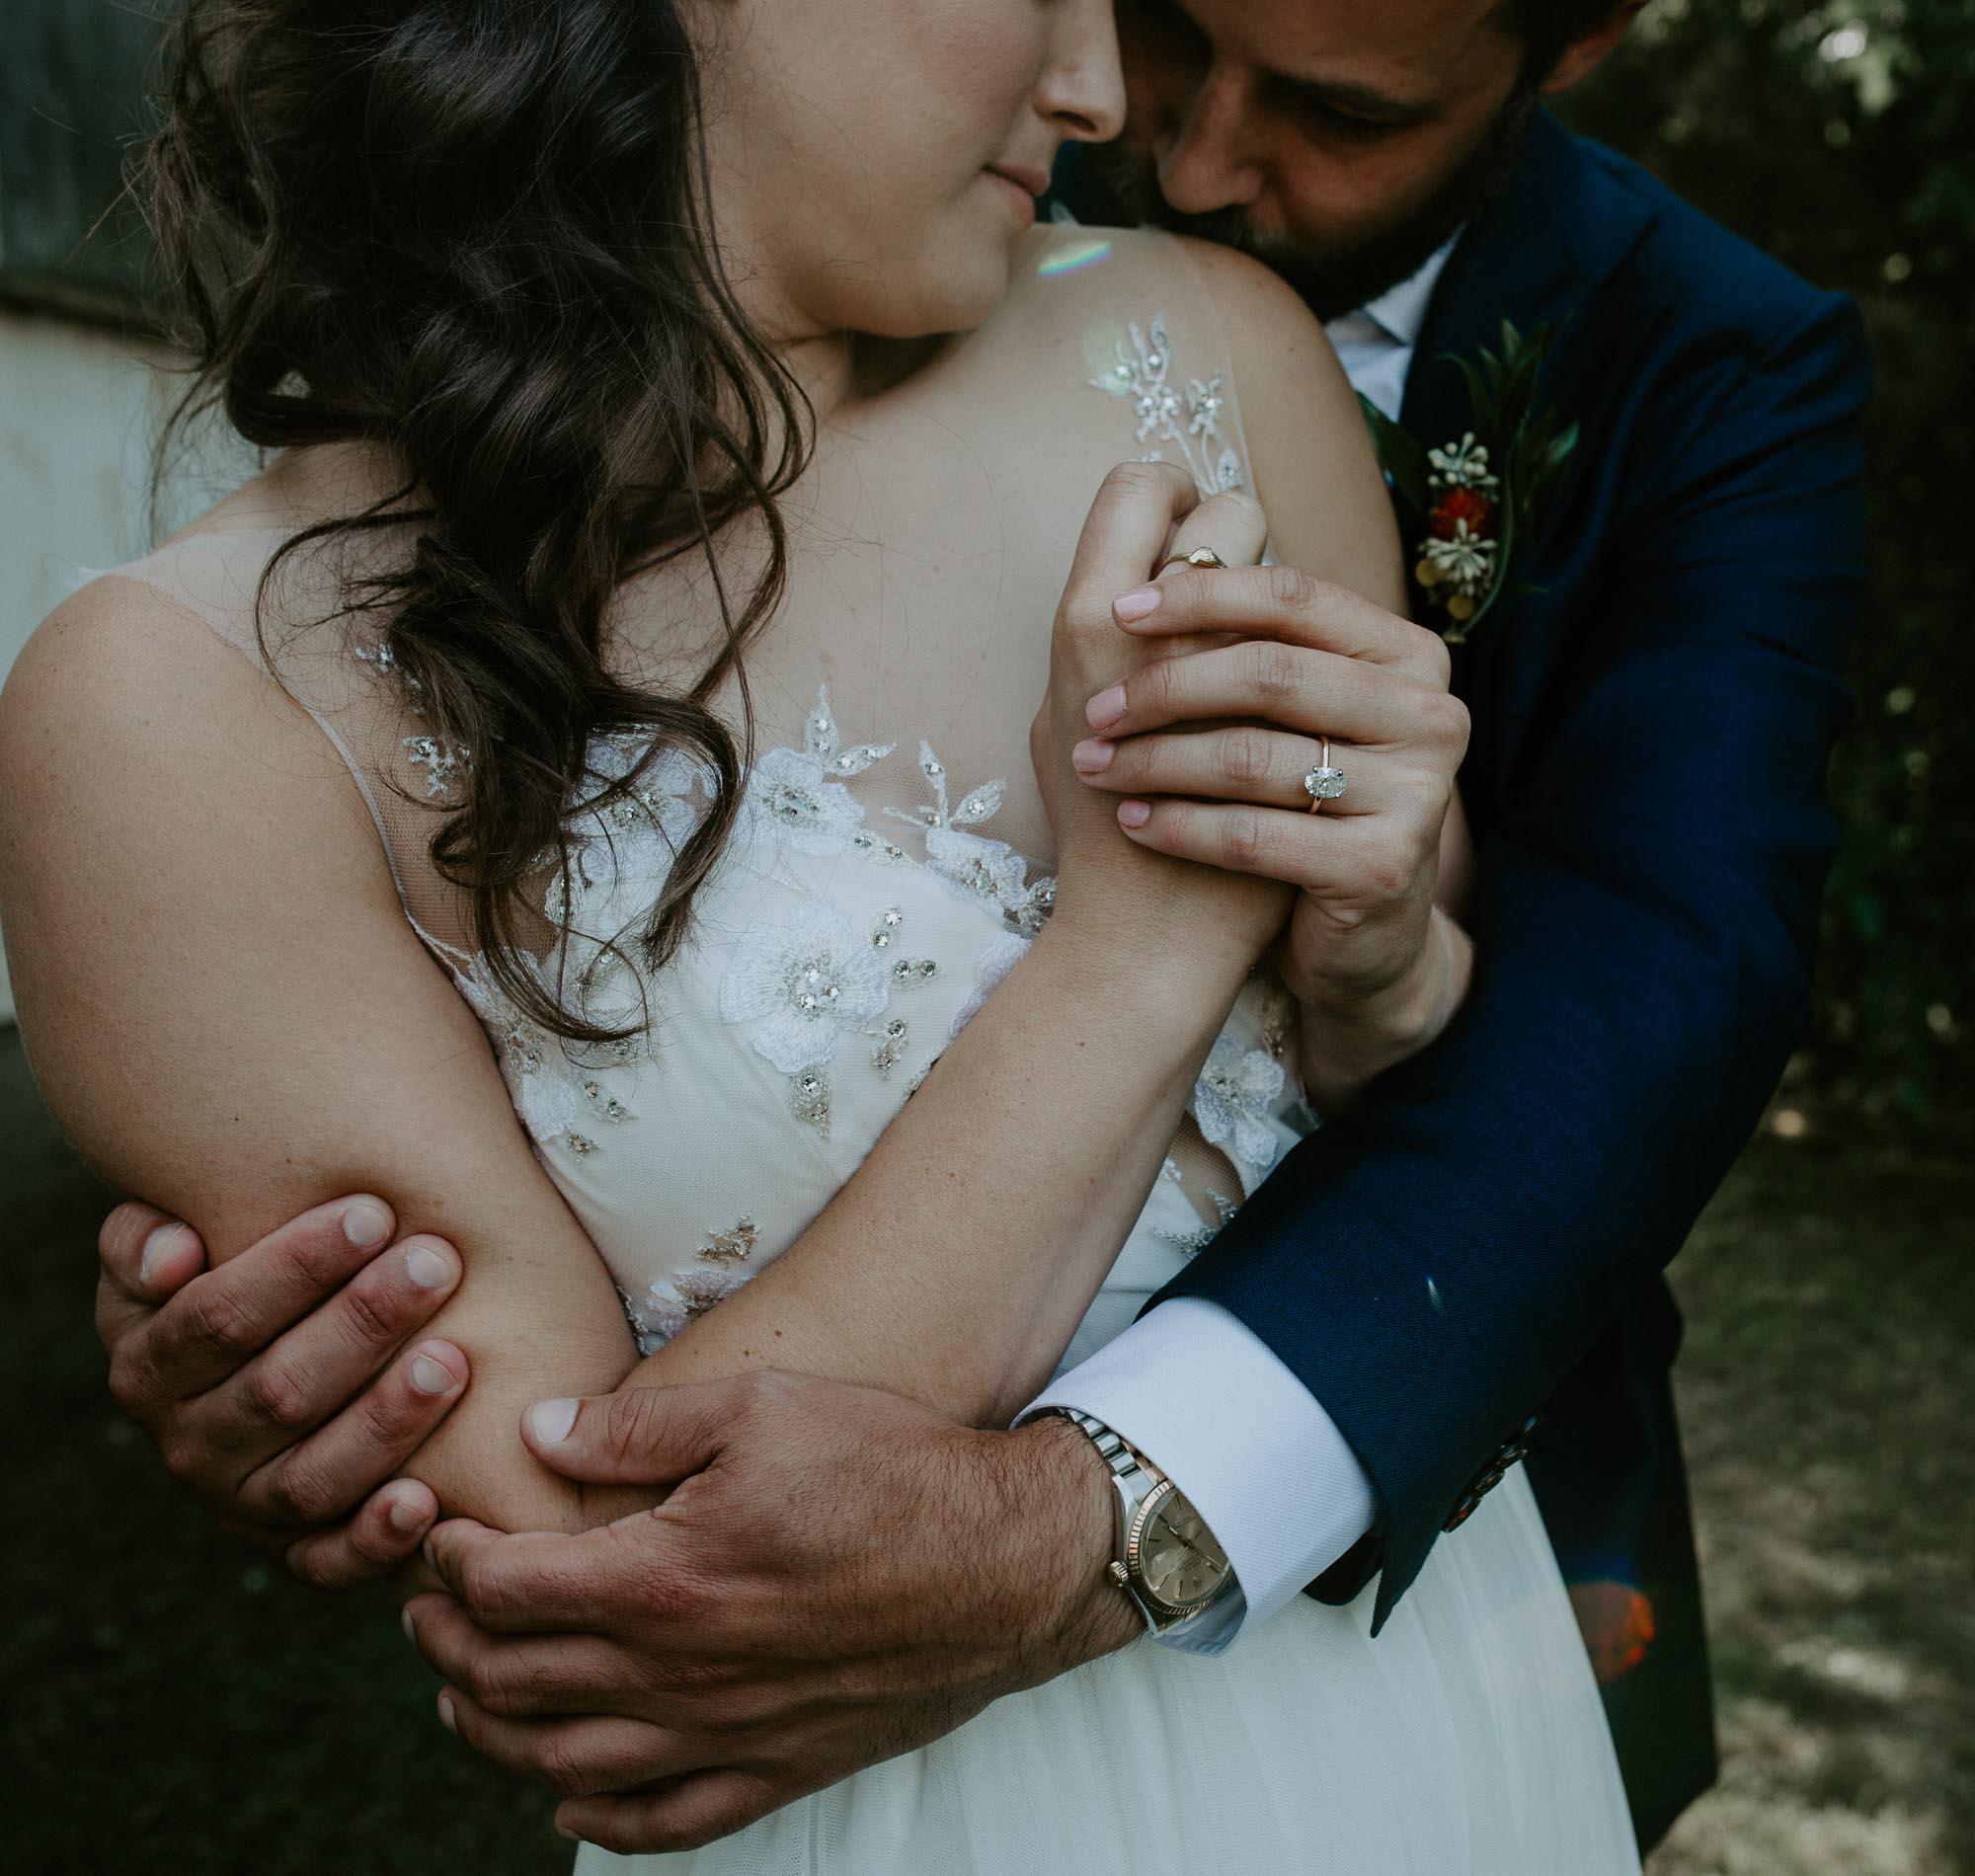 journeyman_distillery_wedding_photographer_chicago_il_wright_photographs-3579.jpg